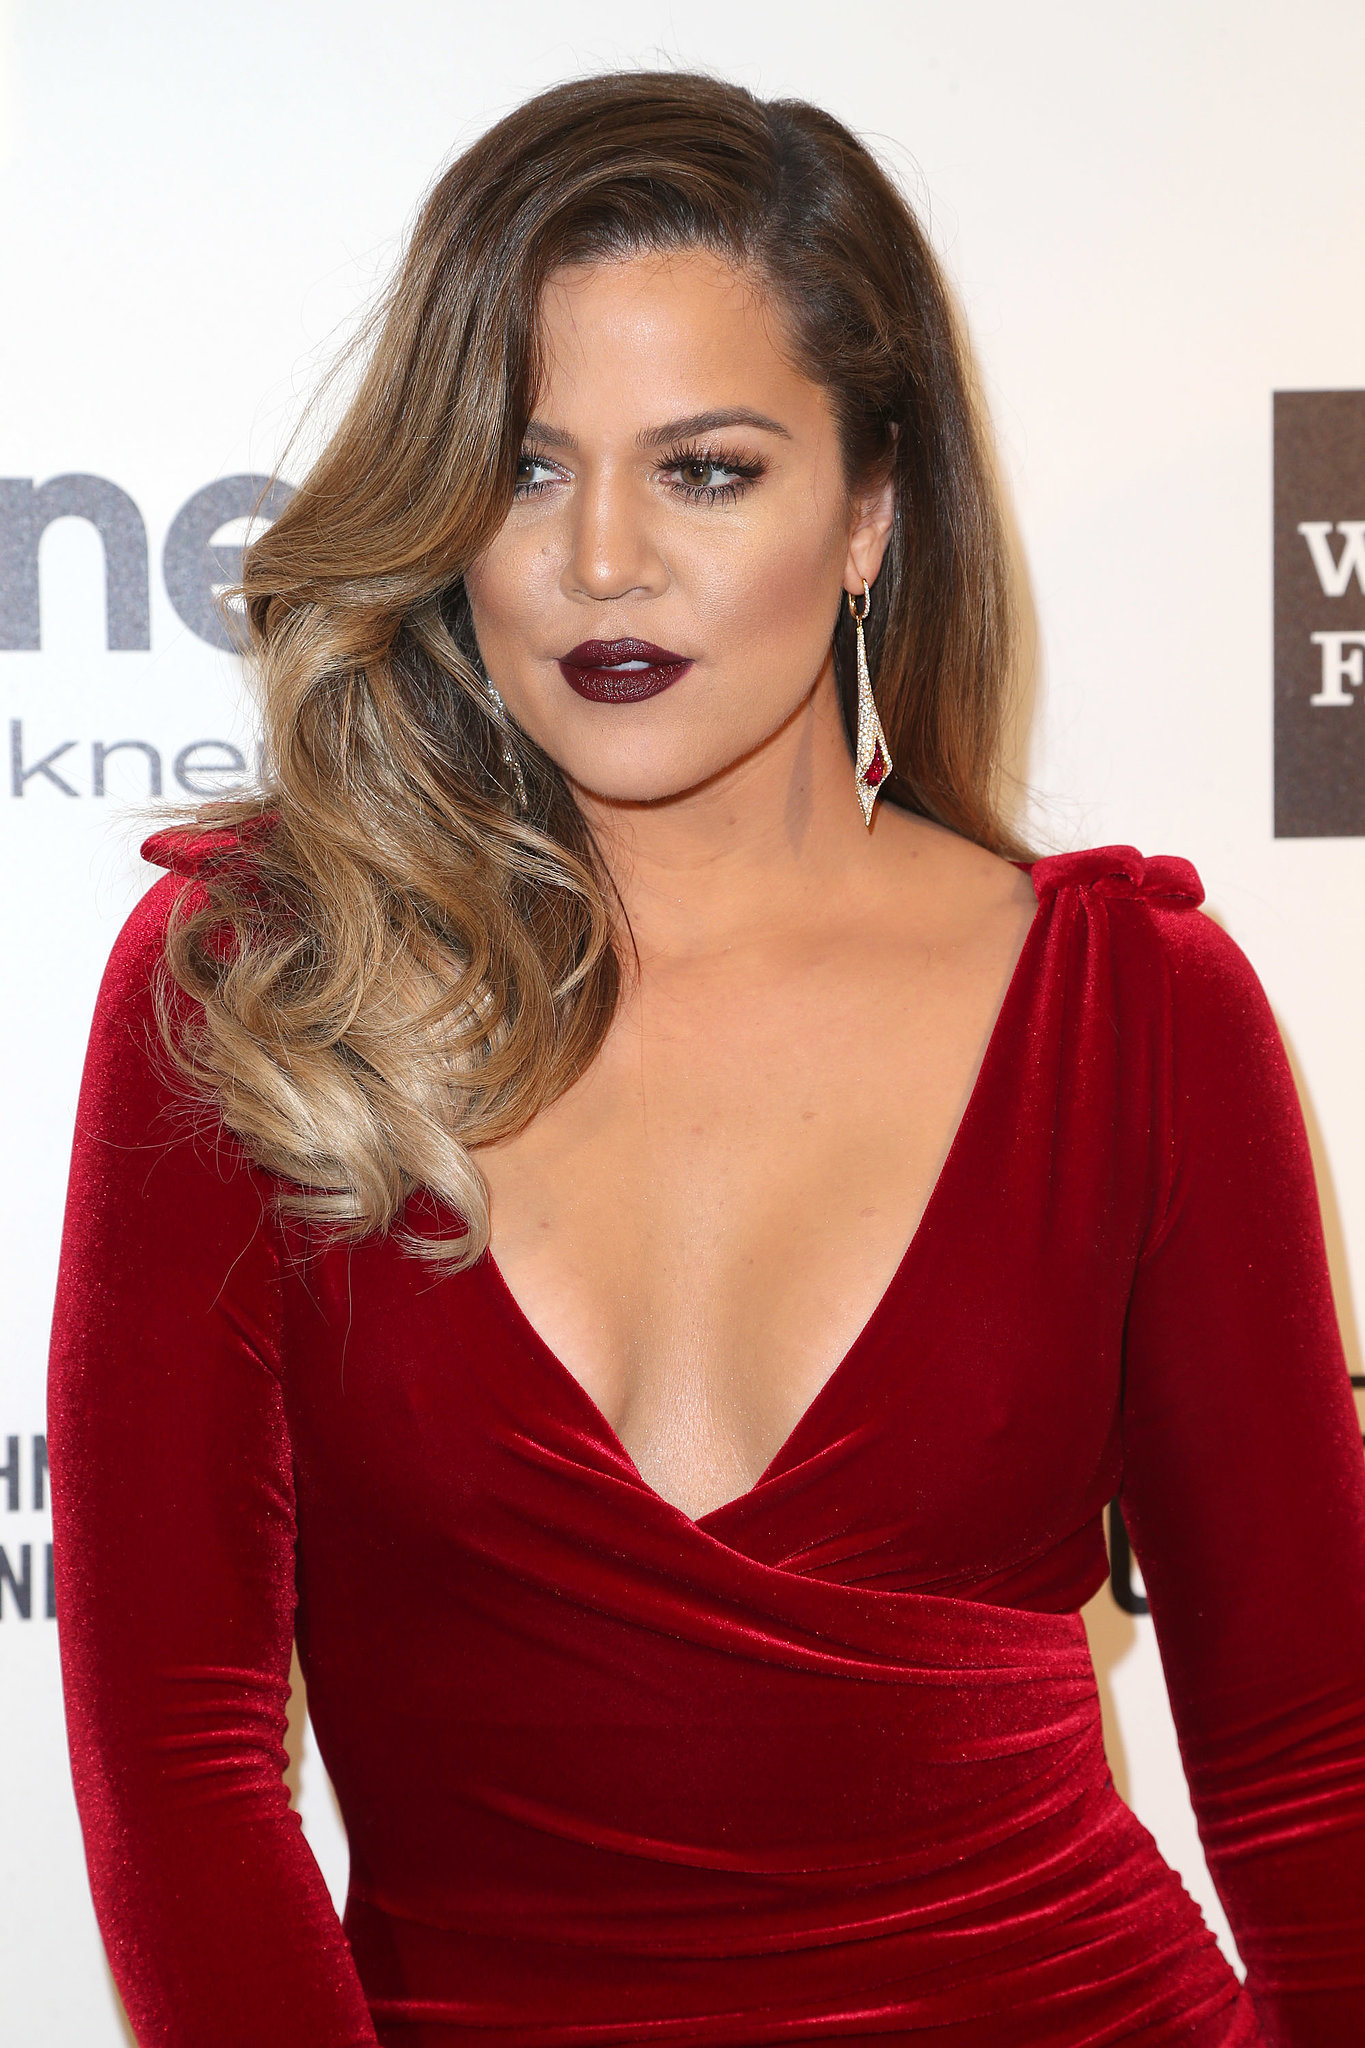 ��� ���� ��������� 2016 , ���� ��� ���� ��������� 2016 Khlo� Kardashian